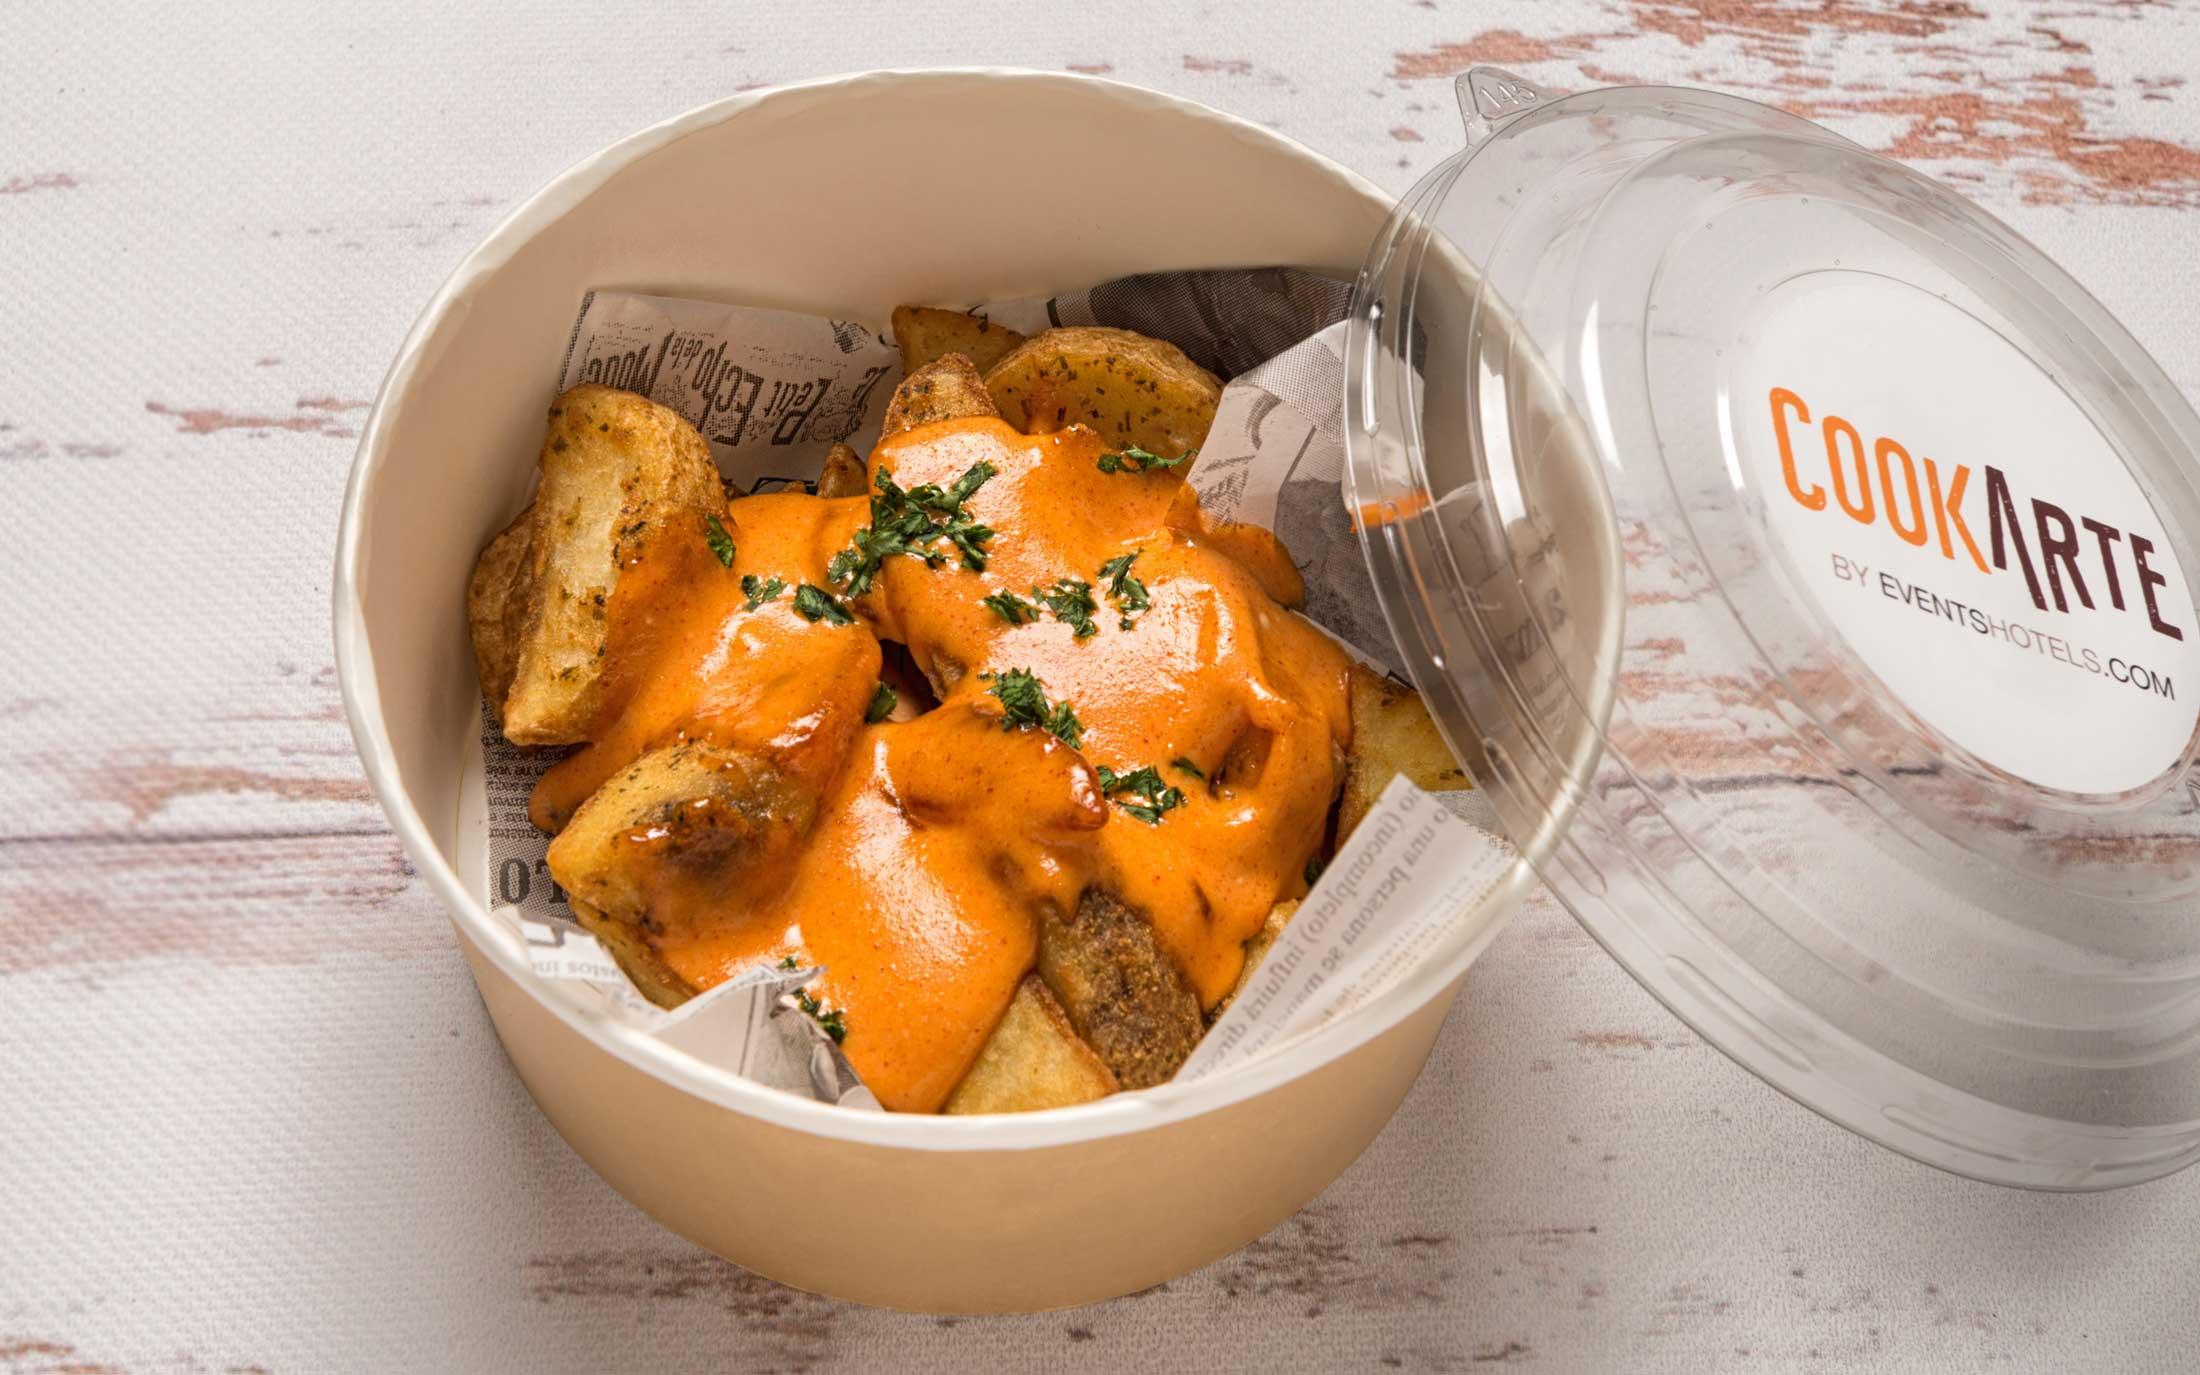 patatas-bravas-cookarte